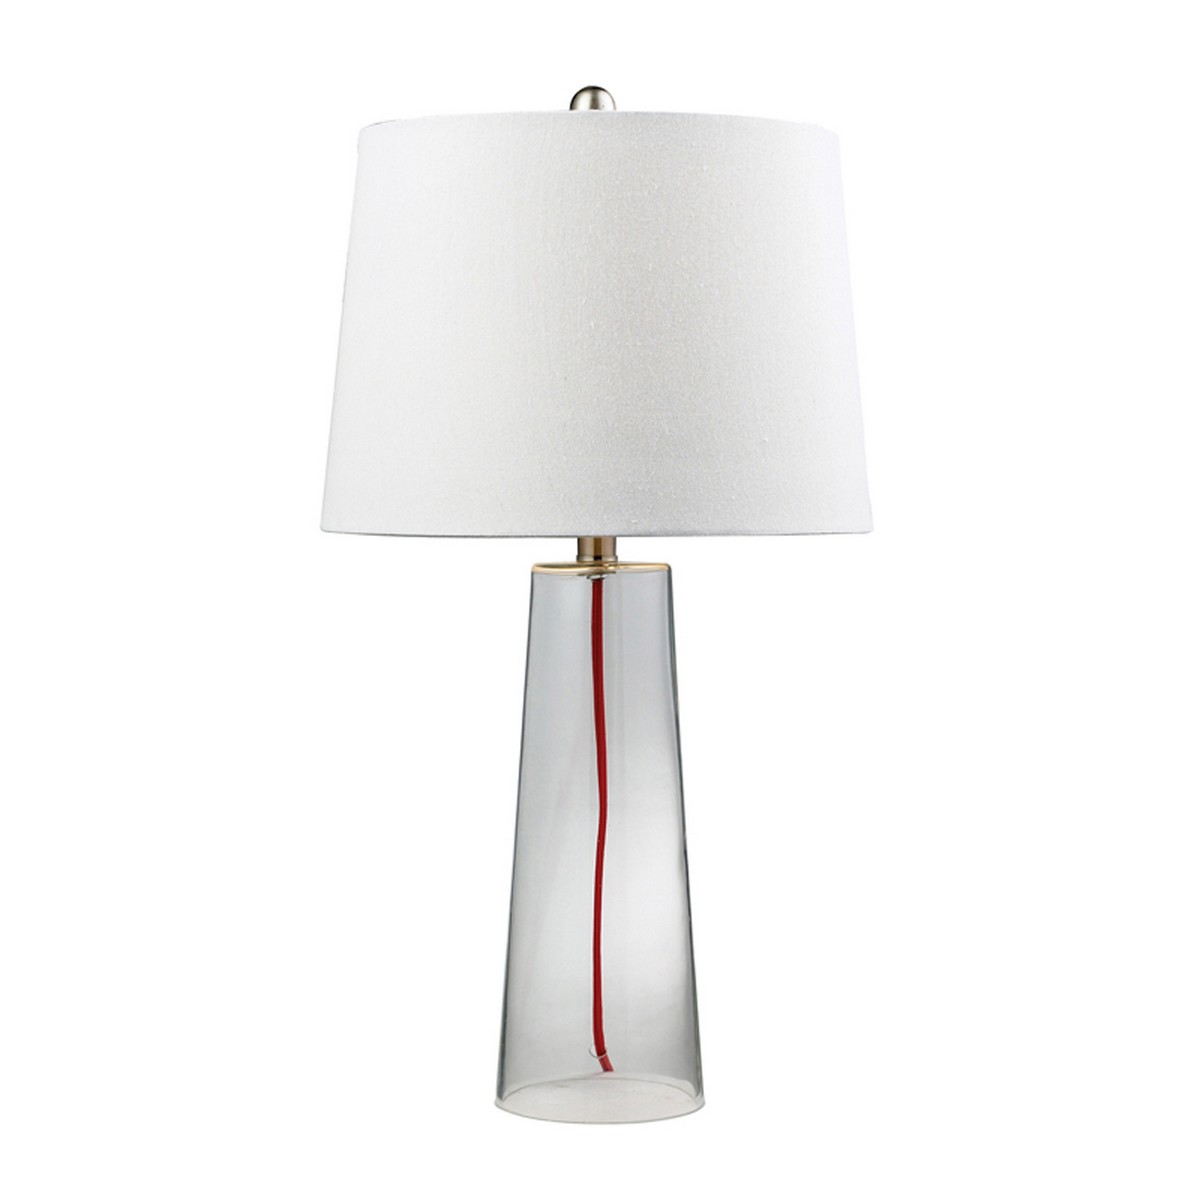 Elk Lighting D138 Table Lamp - Clear